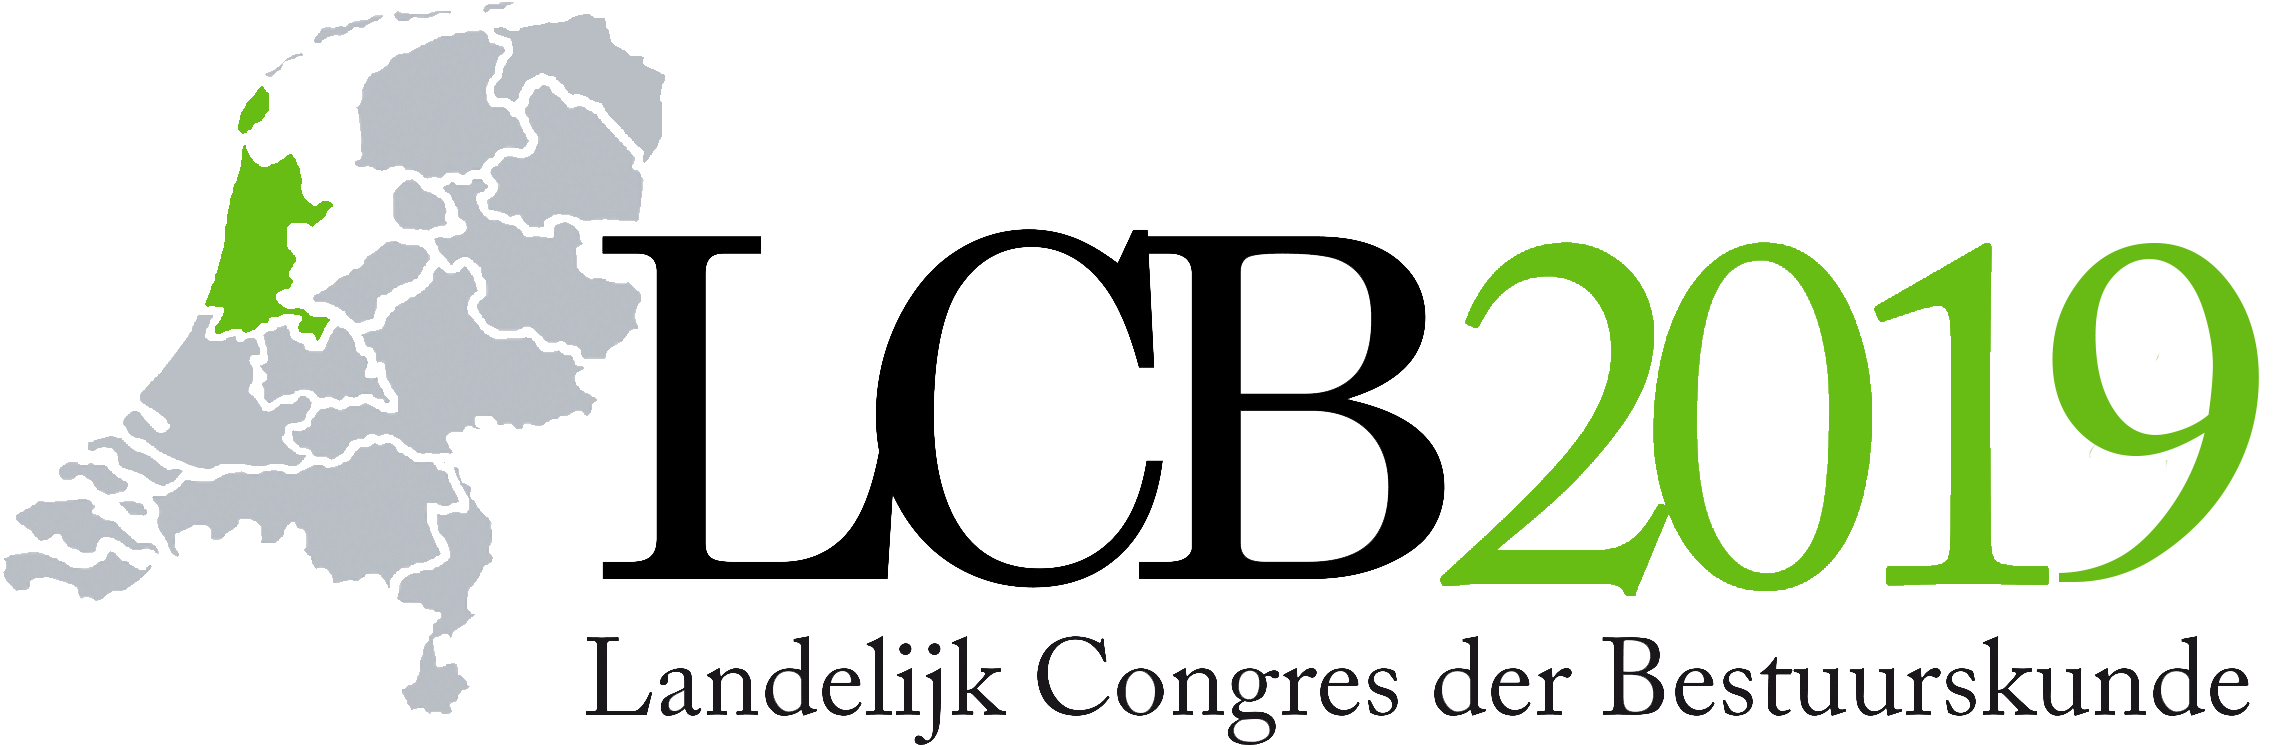 Landelijk Congres der Bestuurskunde (LCB) 2019